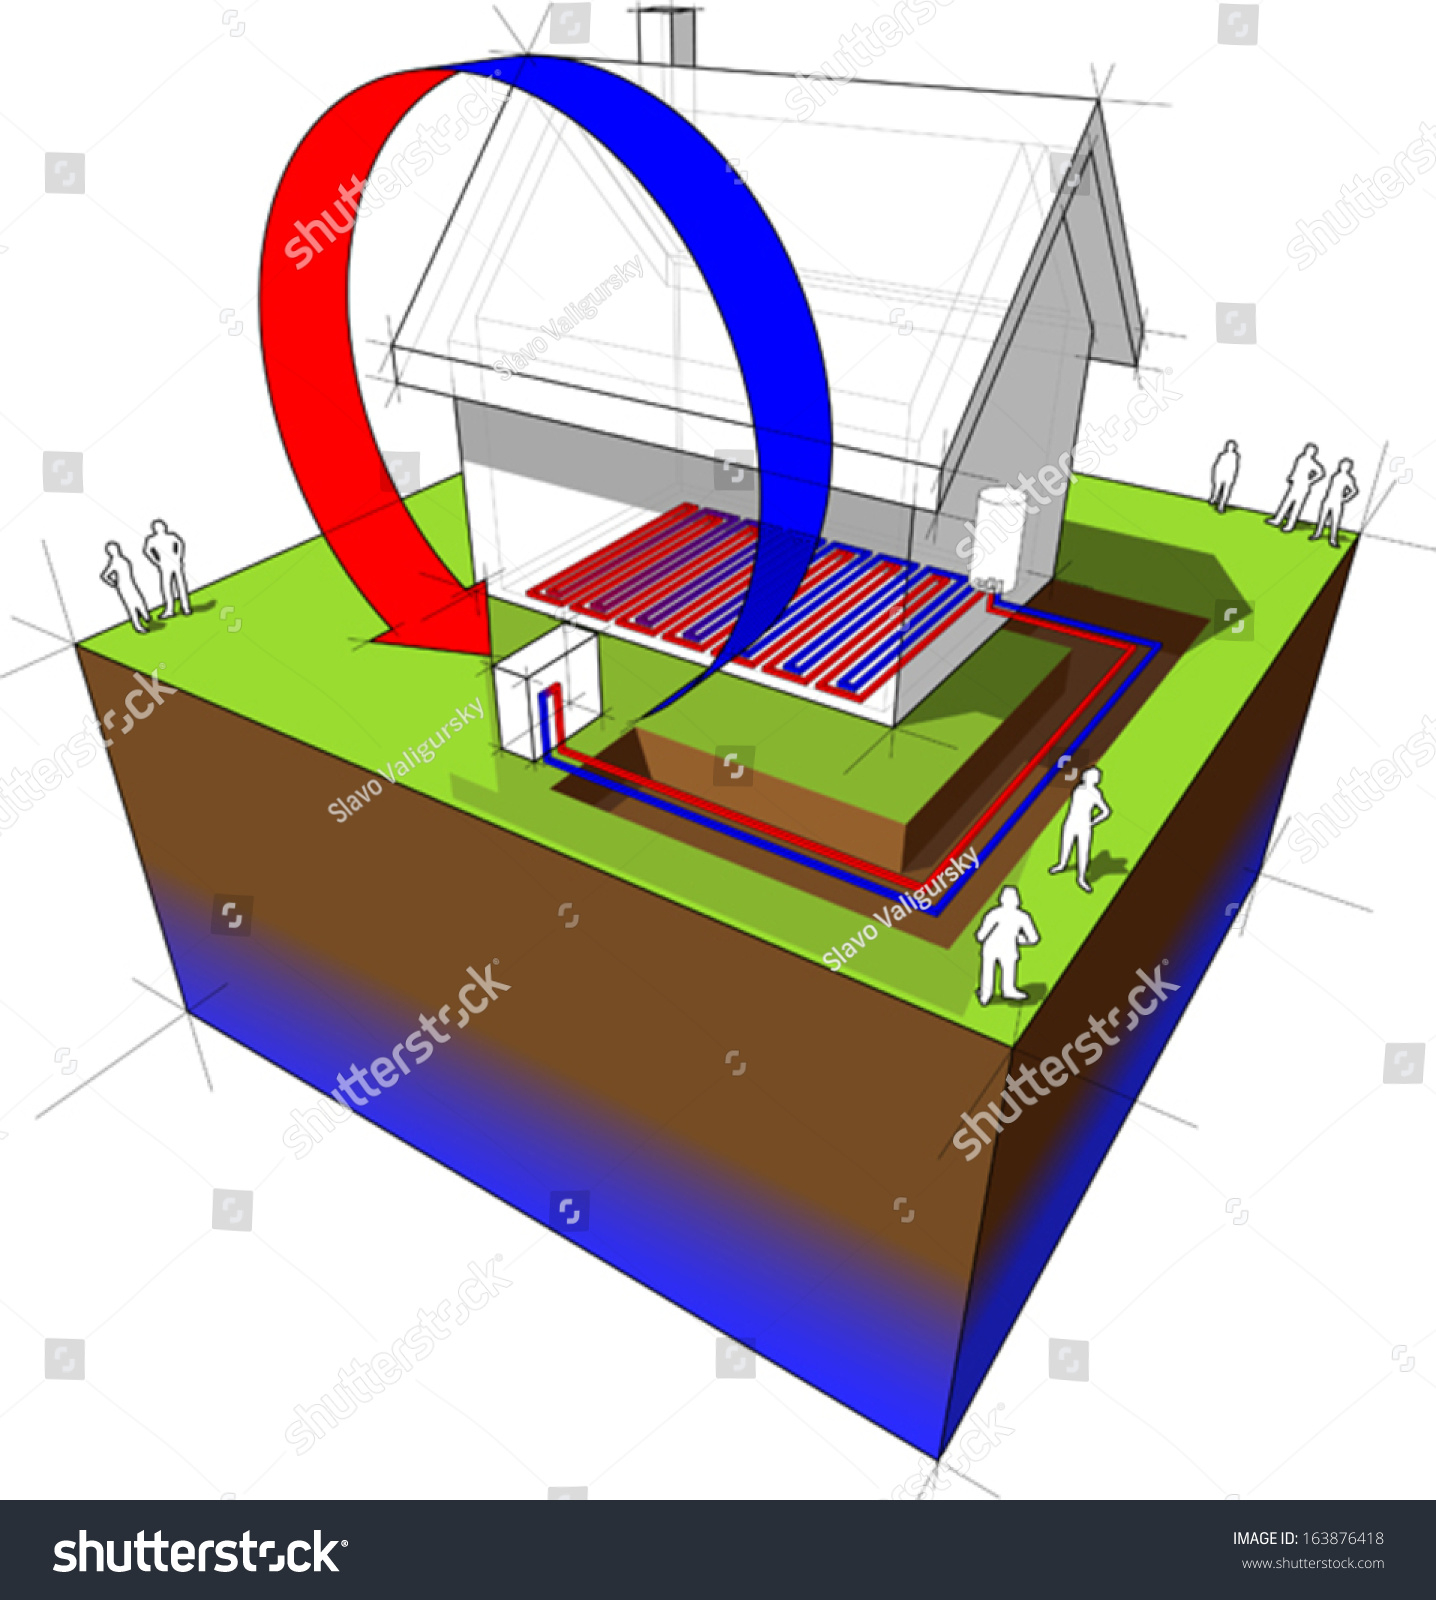 hight resolution of air source heat pump diagram air source heat pump combined